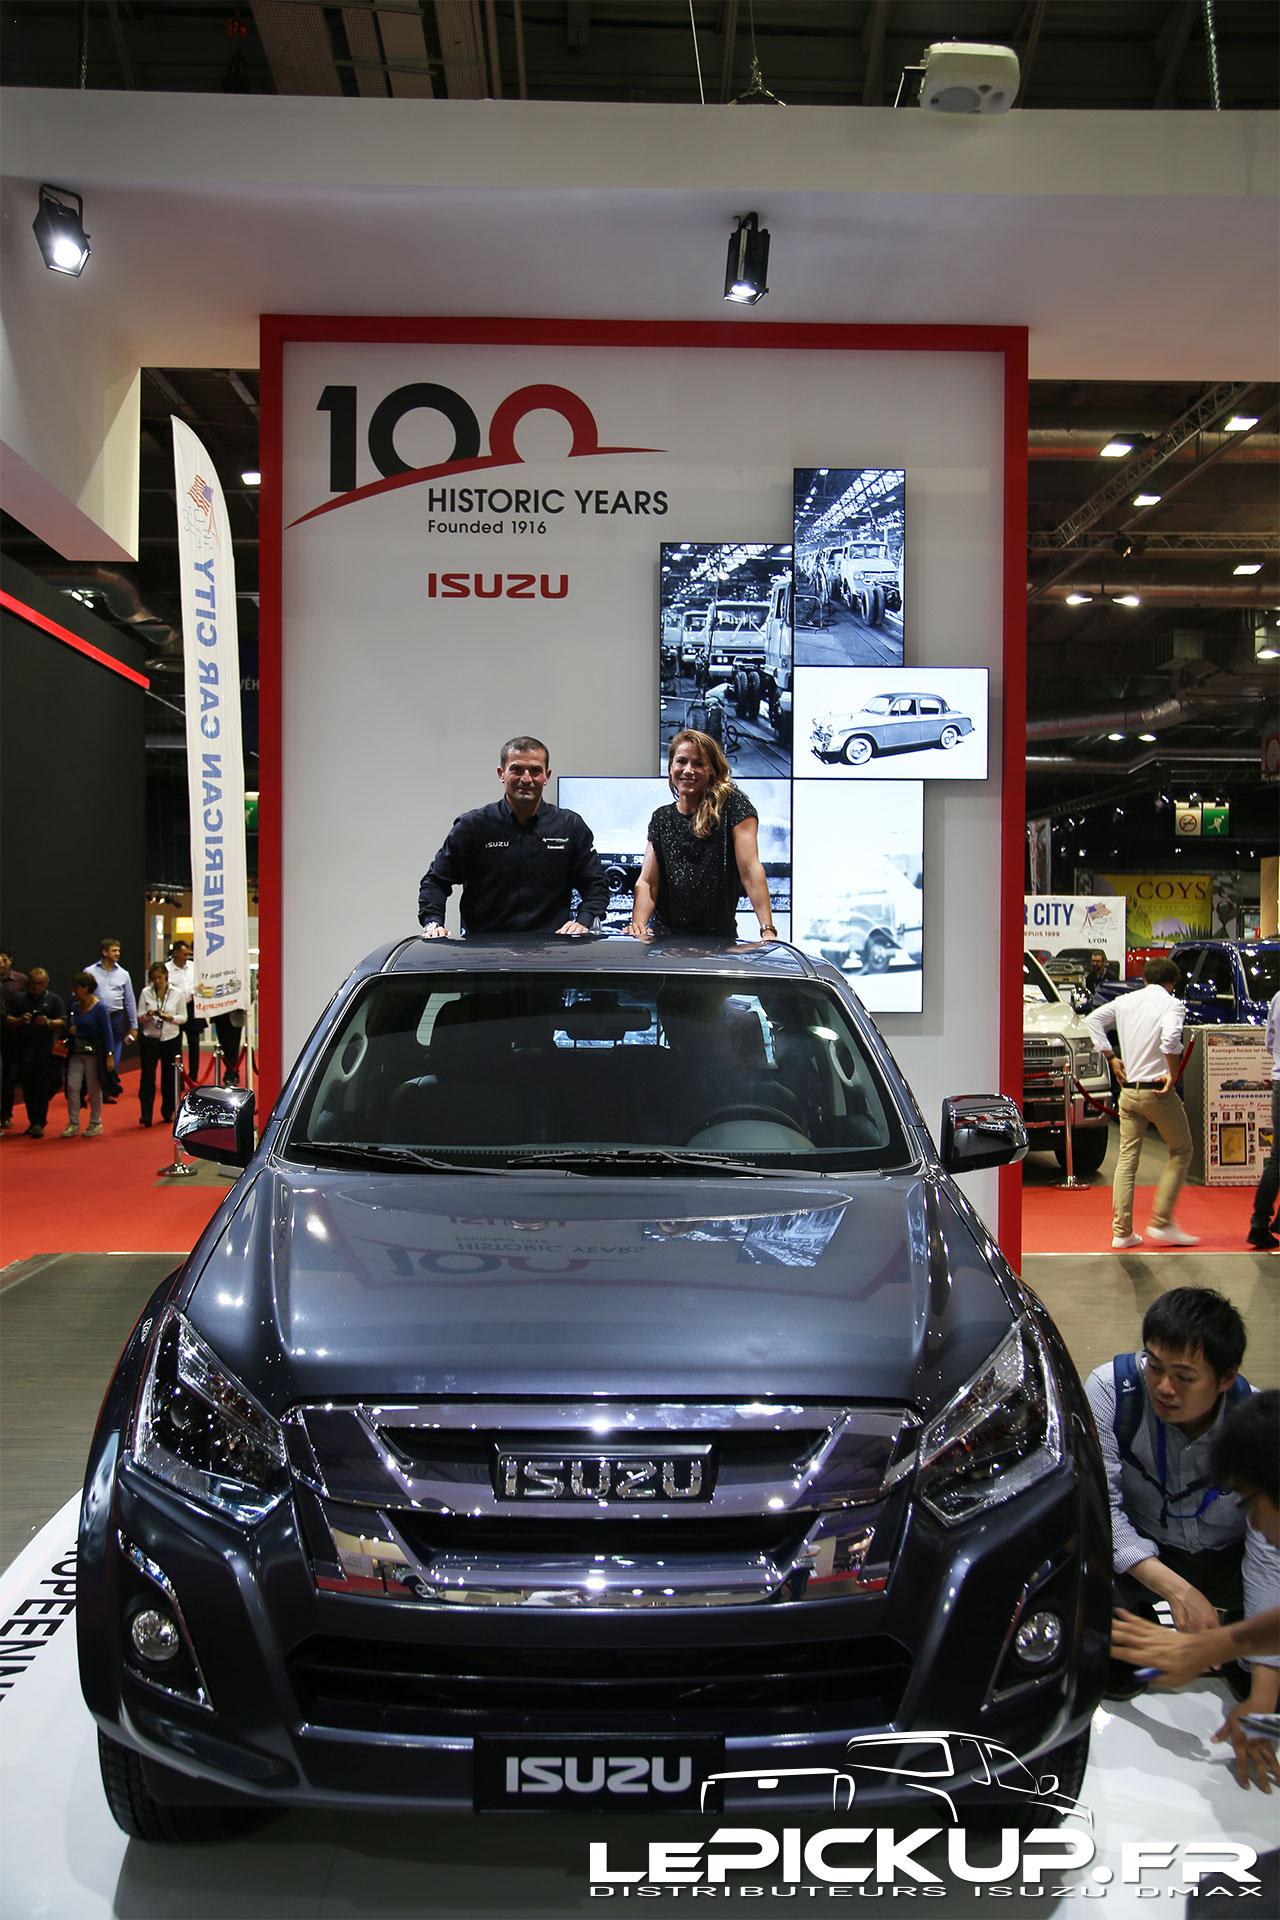 Isuzu Mu X Ls T as well Fotr Ftshbk Grande in addition Dmax Mondial De L Automobile in addition Maxresdefault additionally Aeac C D Ca Ce E D. on isuzu d max